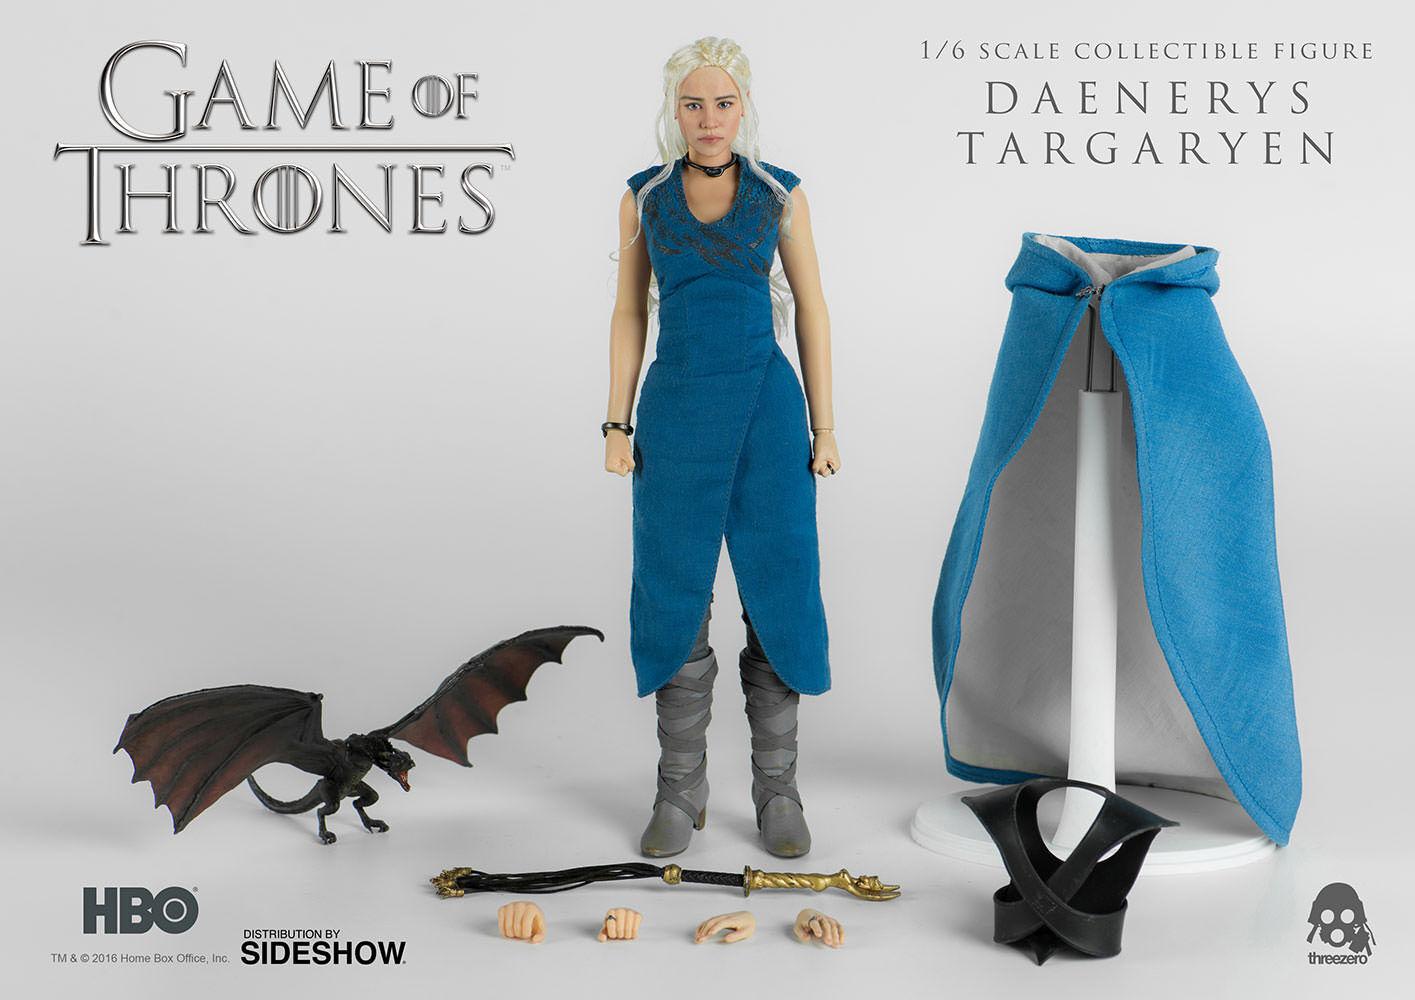 Game of Thrones Daenerys Targaryen Sixth Scale Action Figure Threezero Sideshow